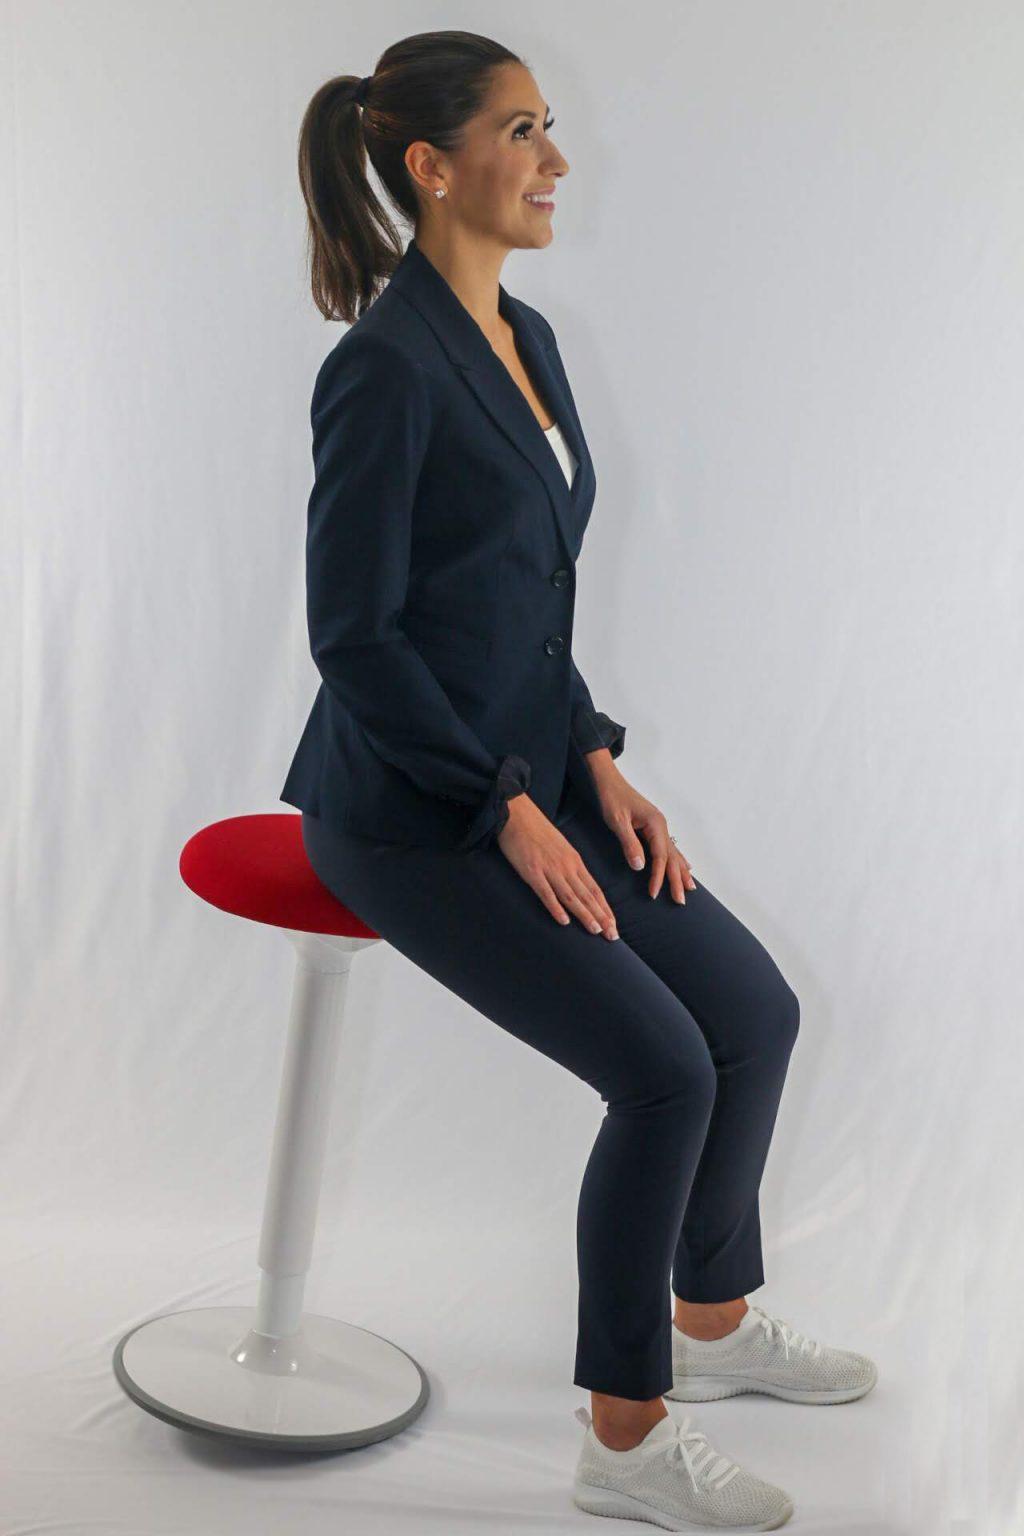 Swopper Chair